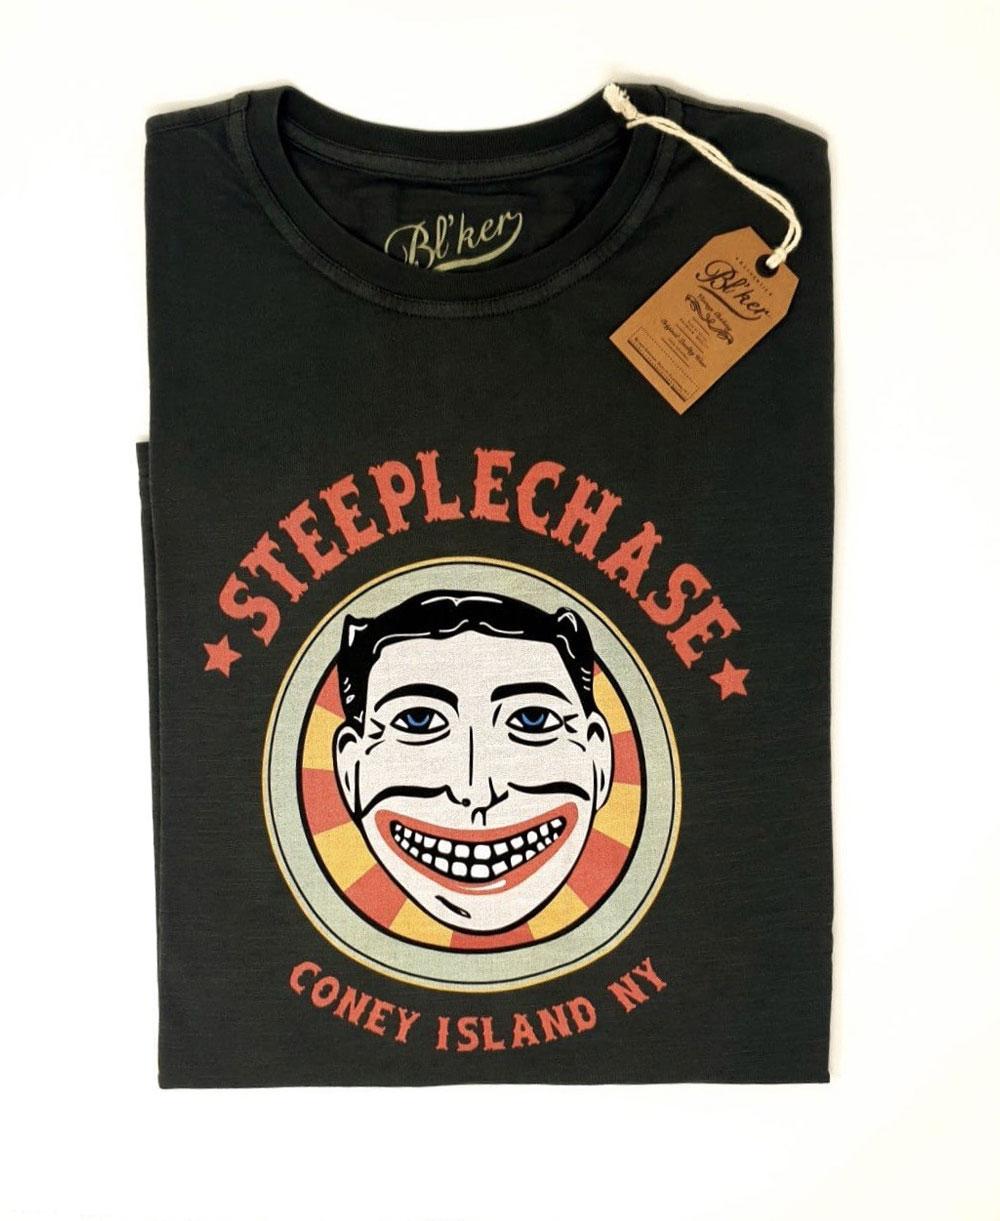 Steeplechase Camiseta Manga Corta para Hombre Faded Black